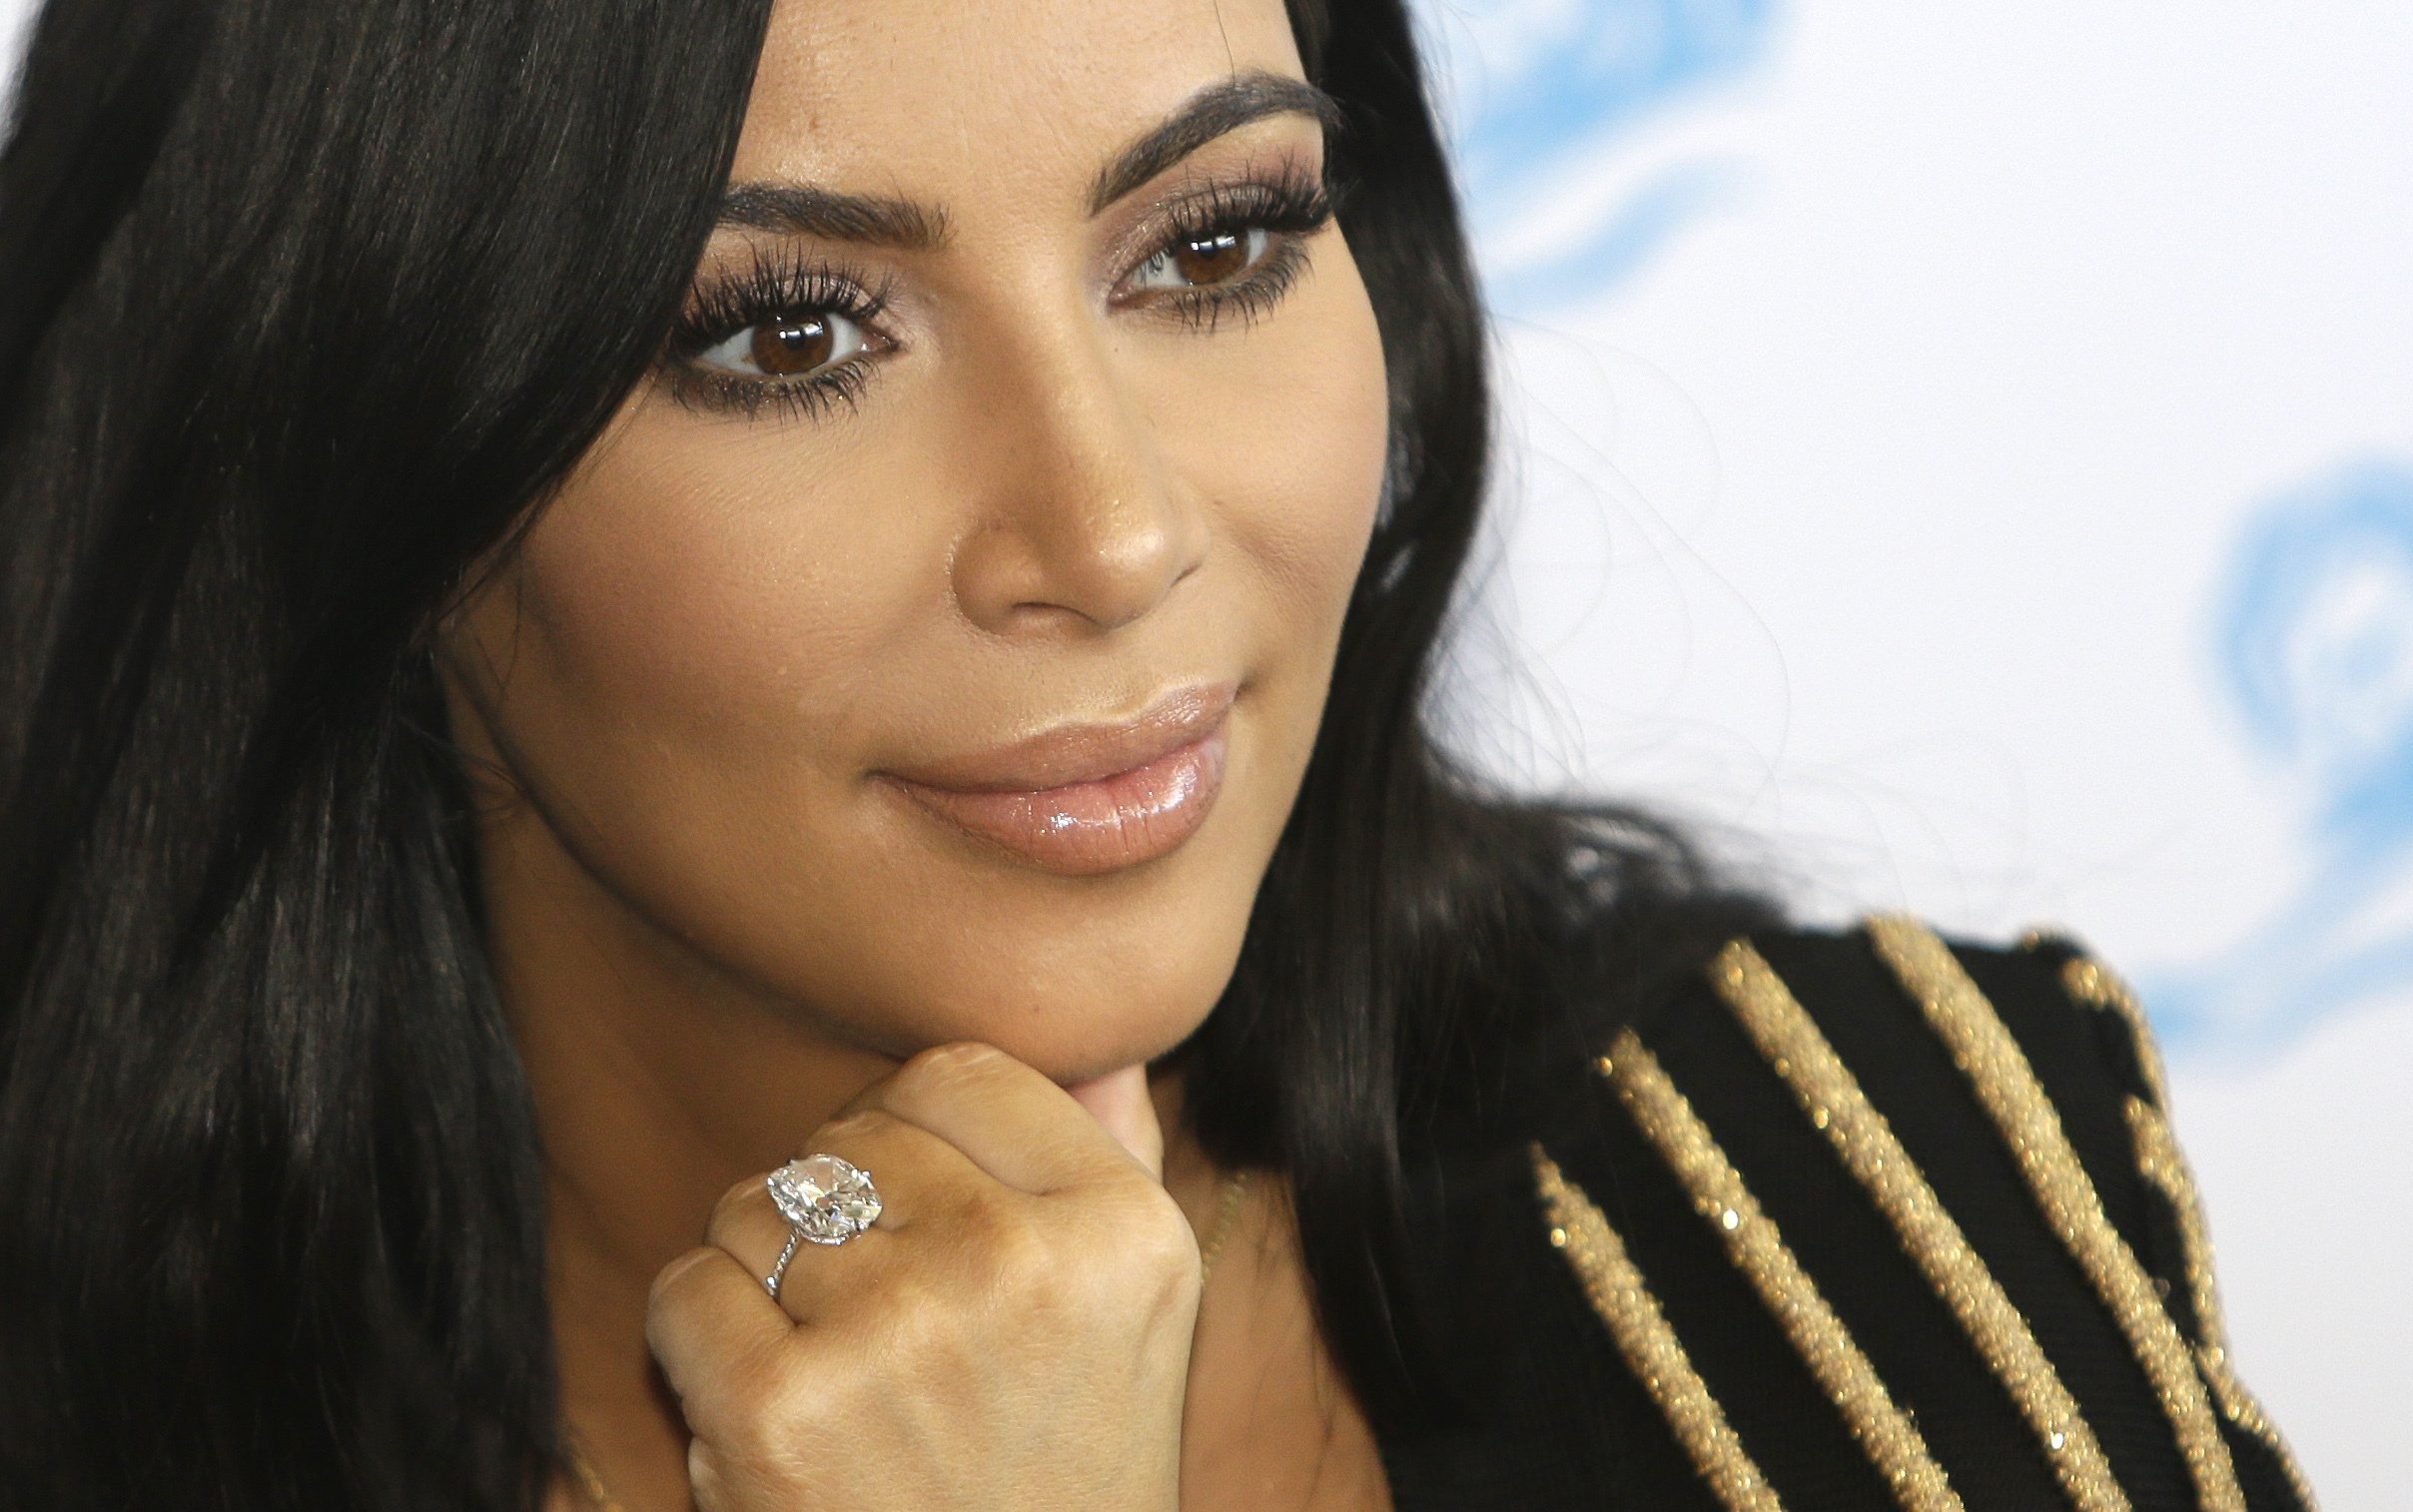 Armed jewelry thieves target Kardashian West in Paris